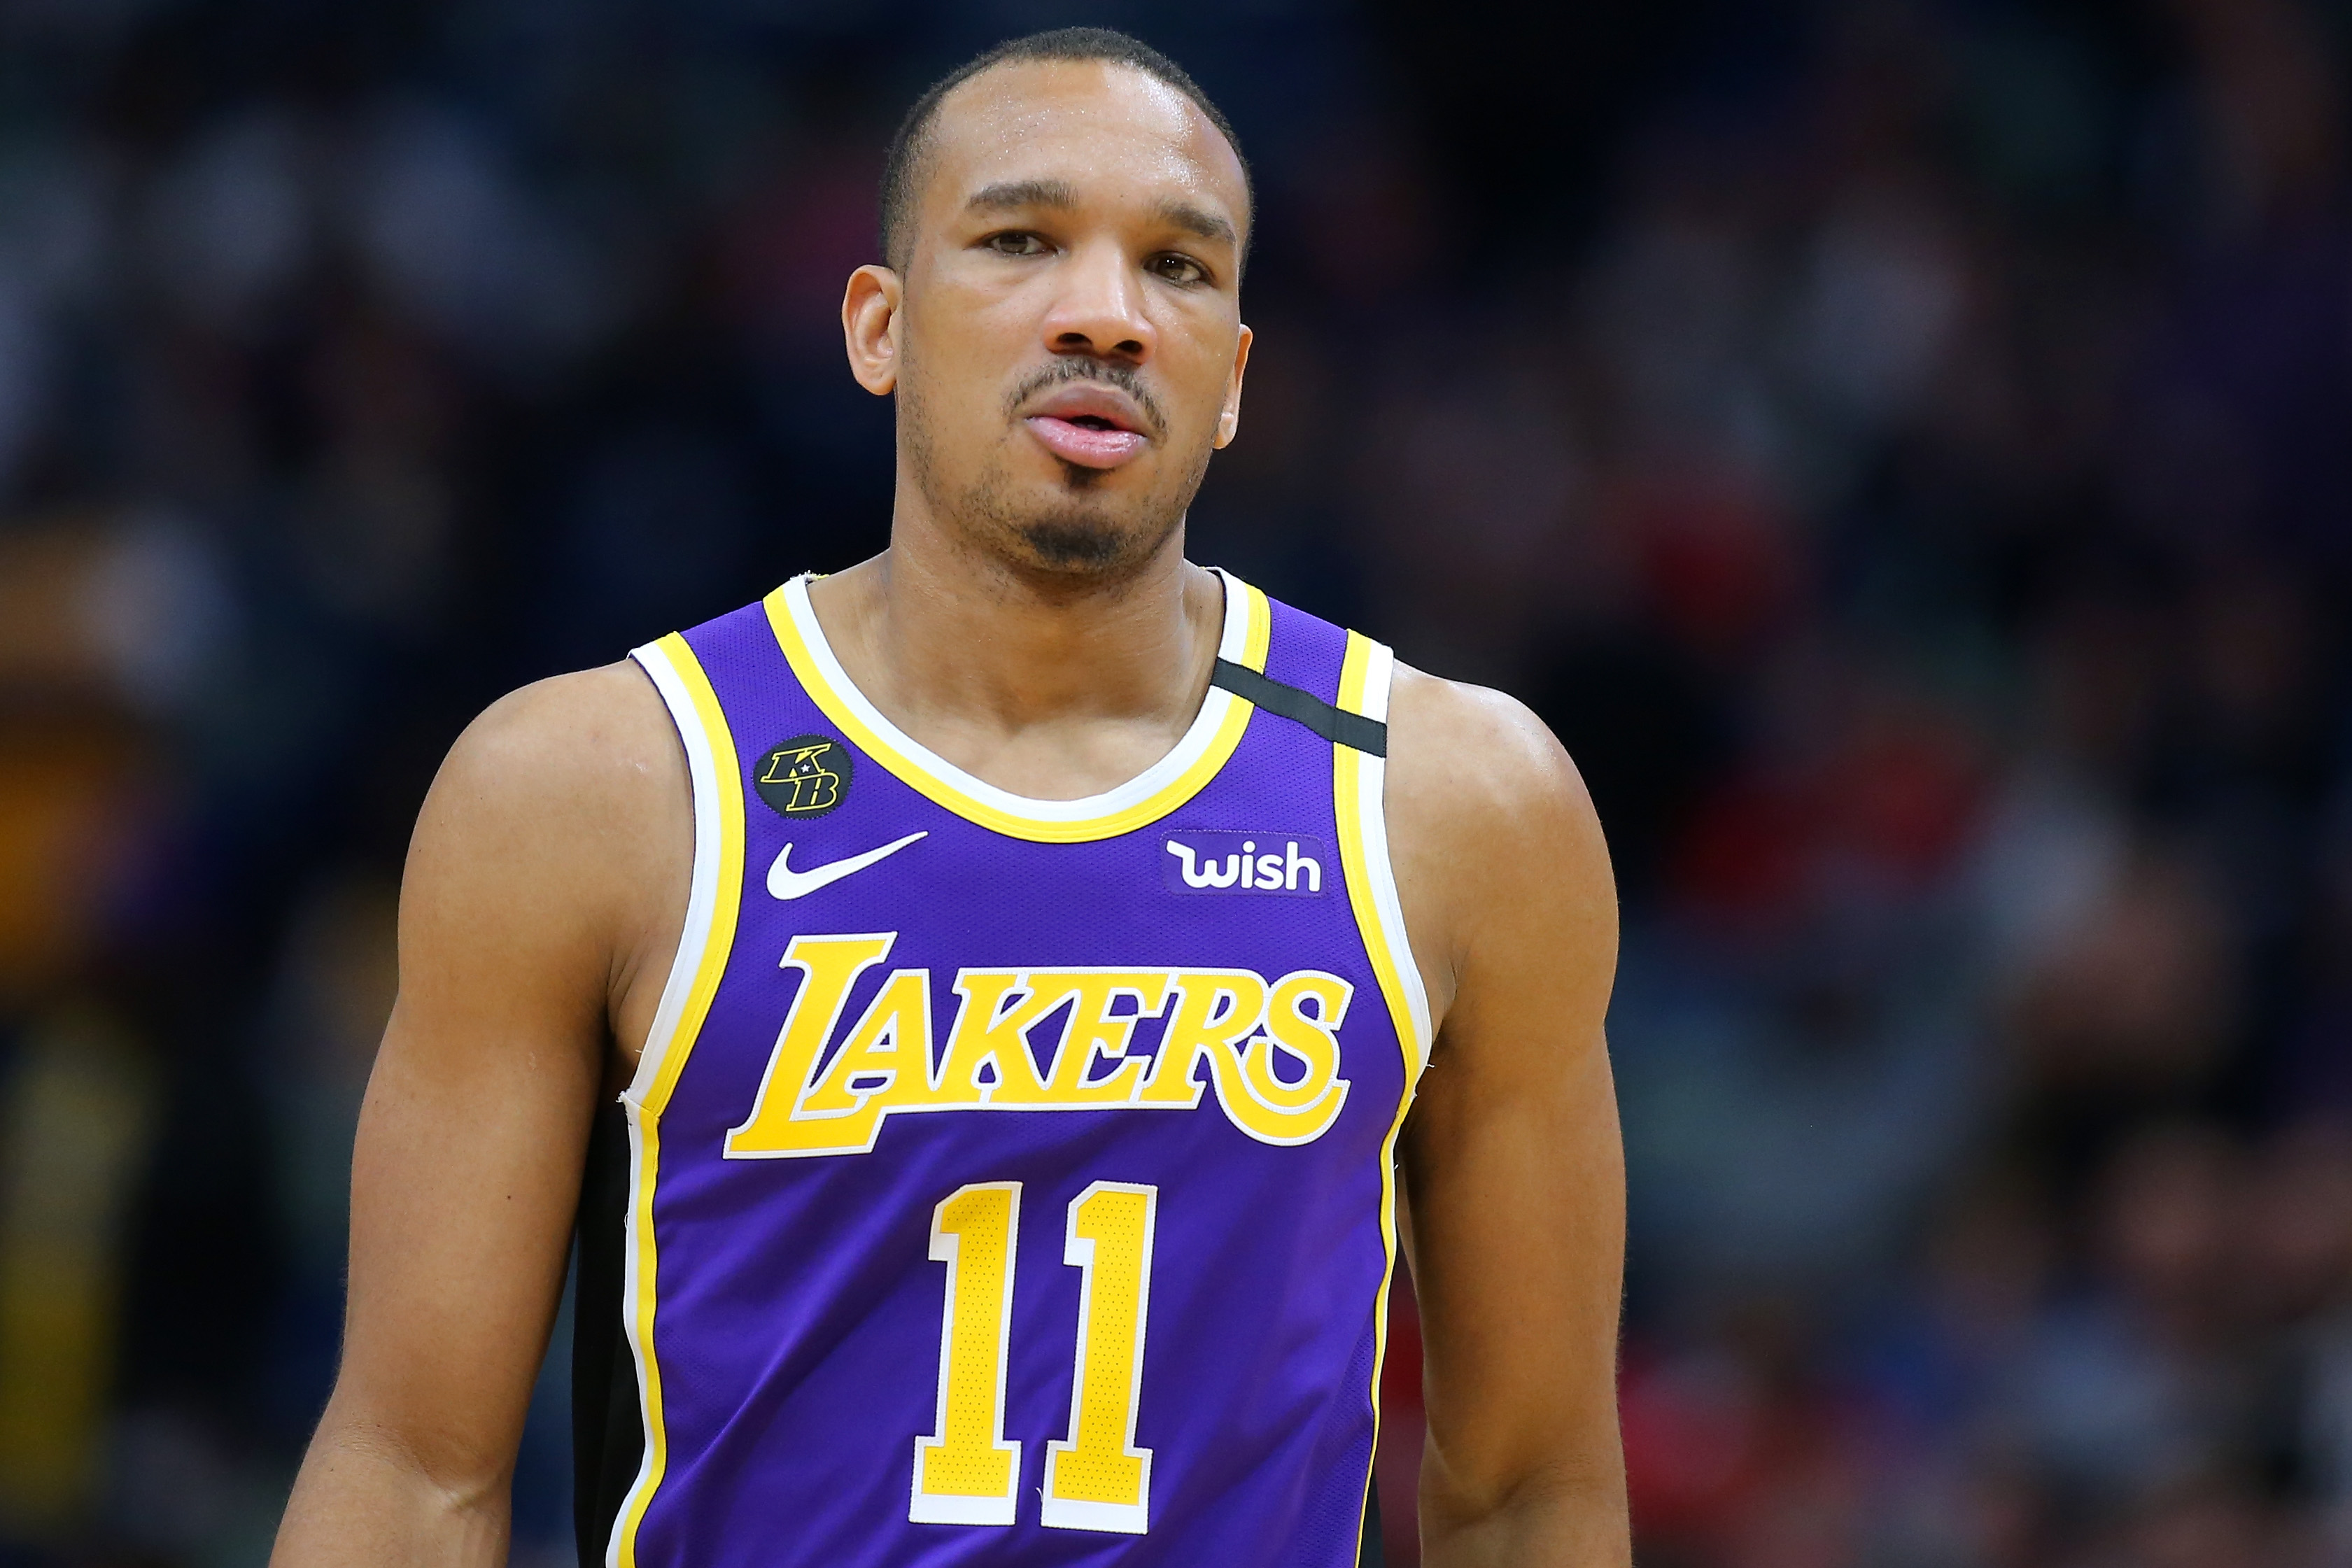 Avery Bradley of Los Angeles Lakers